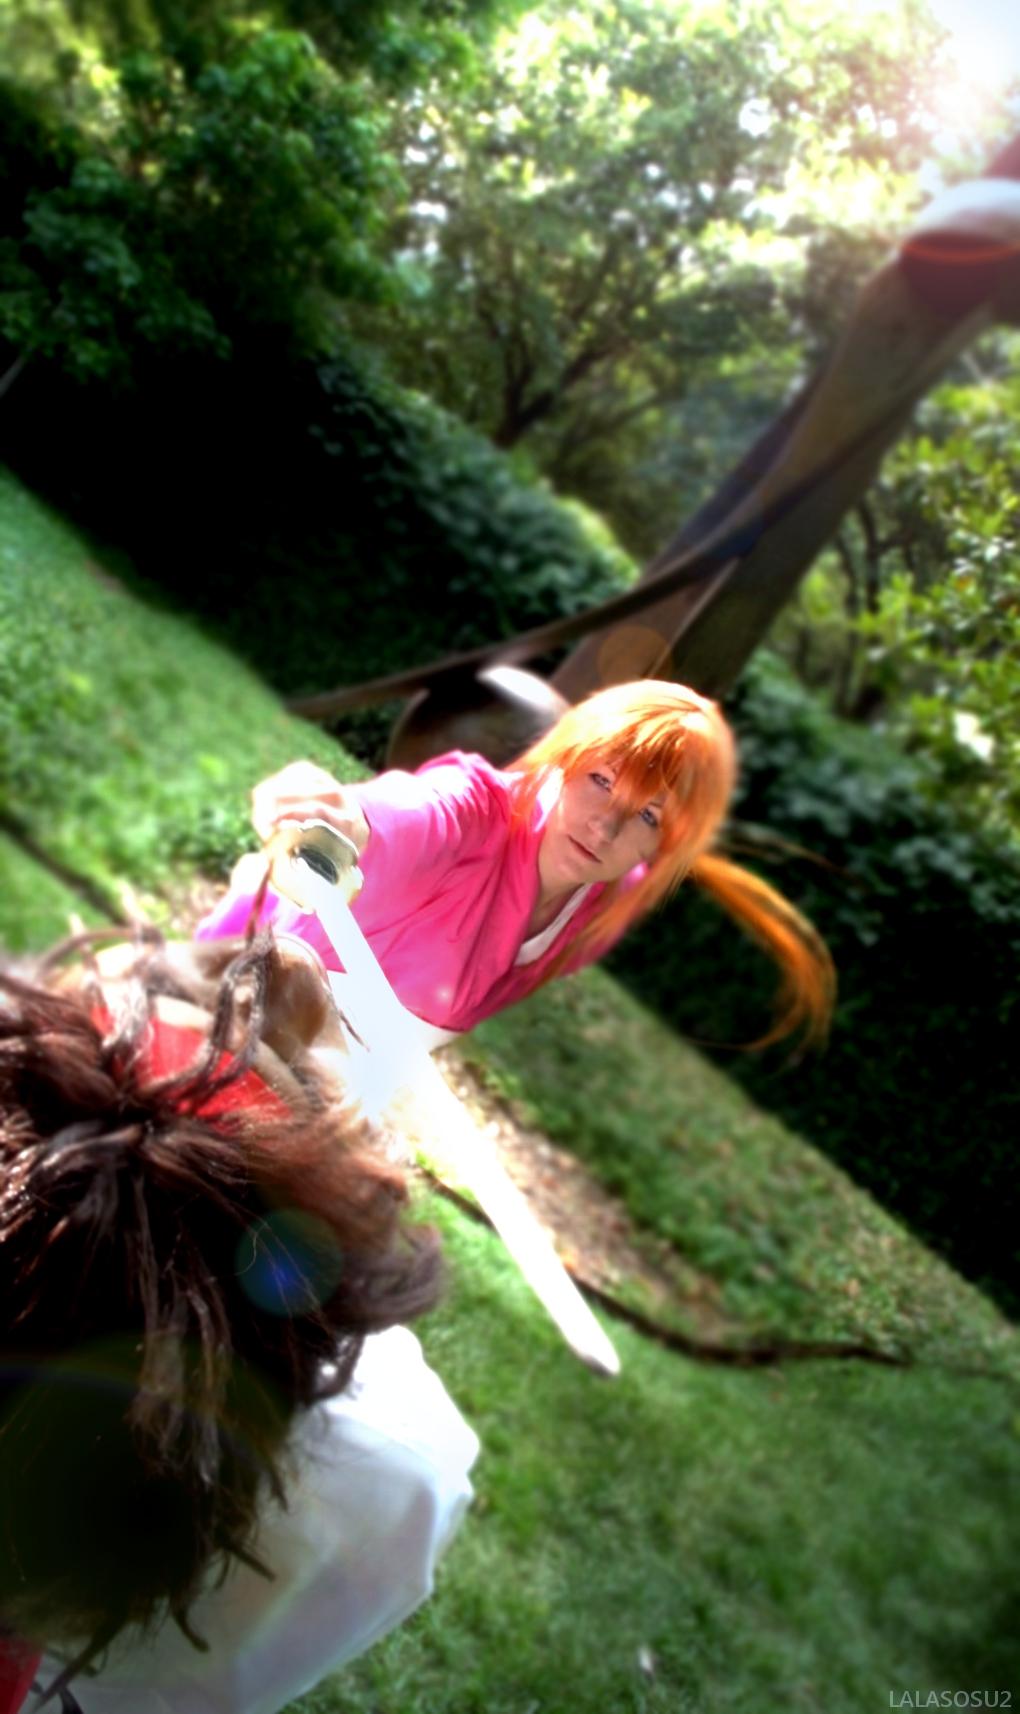 A-kon 24 - Sanosuke vs. Kenshin by LALASOSU2